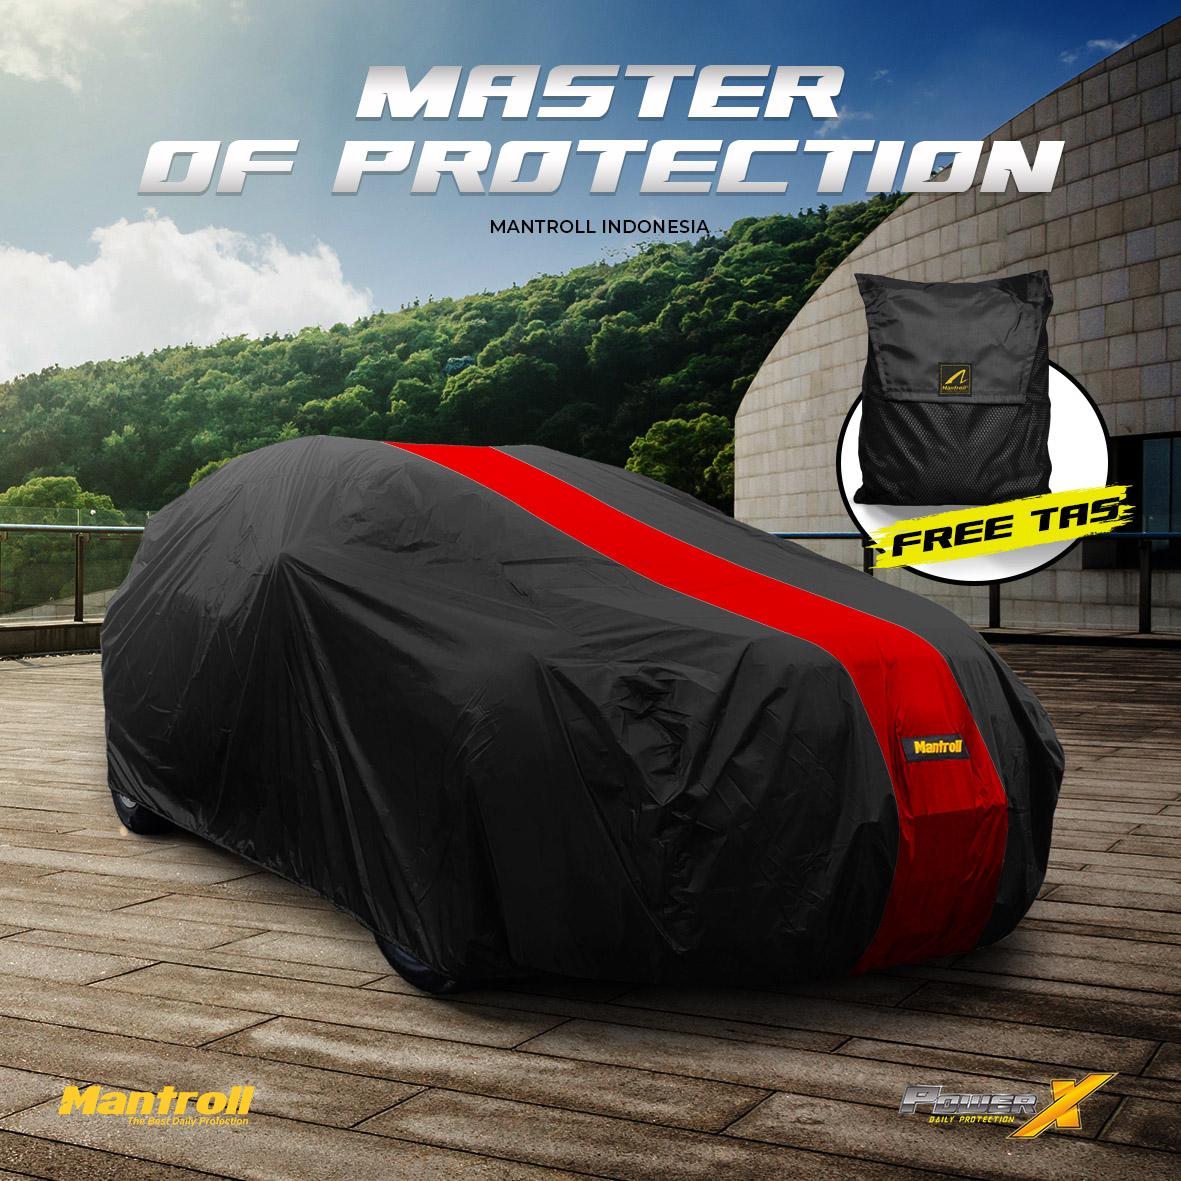 mantroll sarung mobil cover mobil penutup mobil mantel mobil outdoor pajero fortuner innova mux mega best er